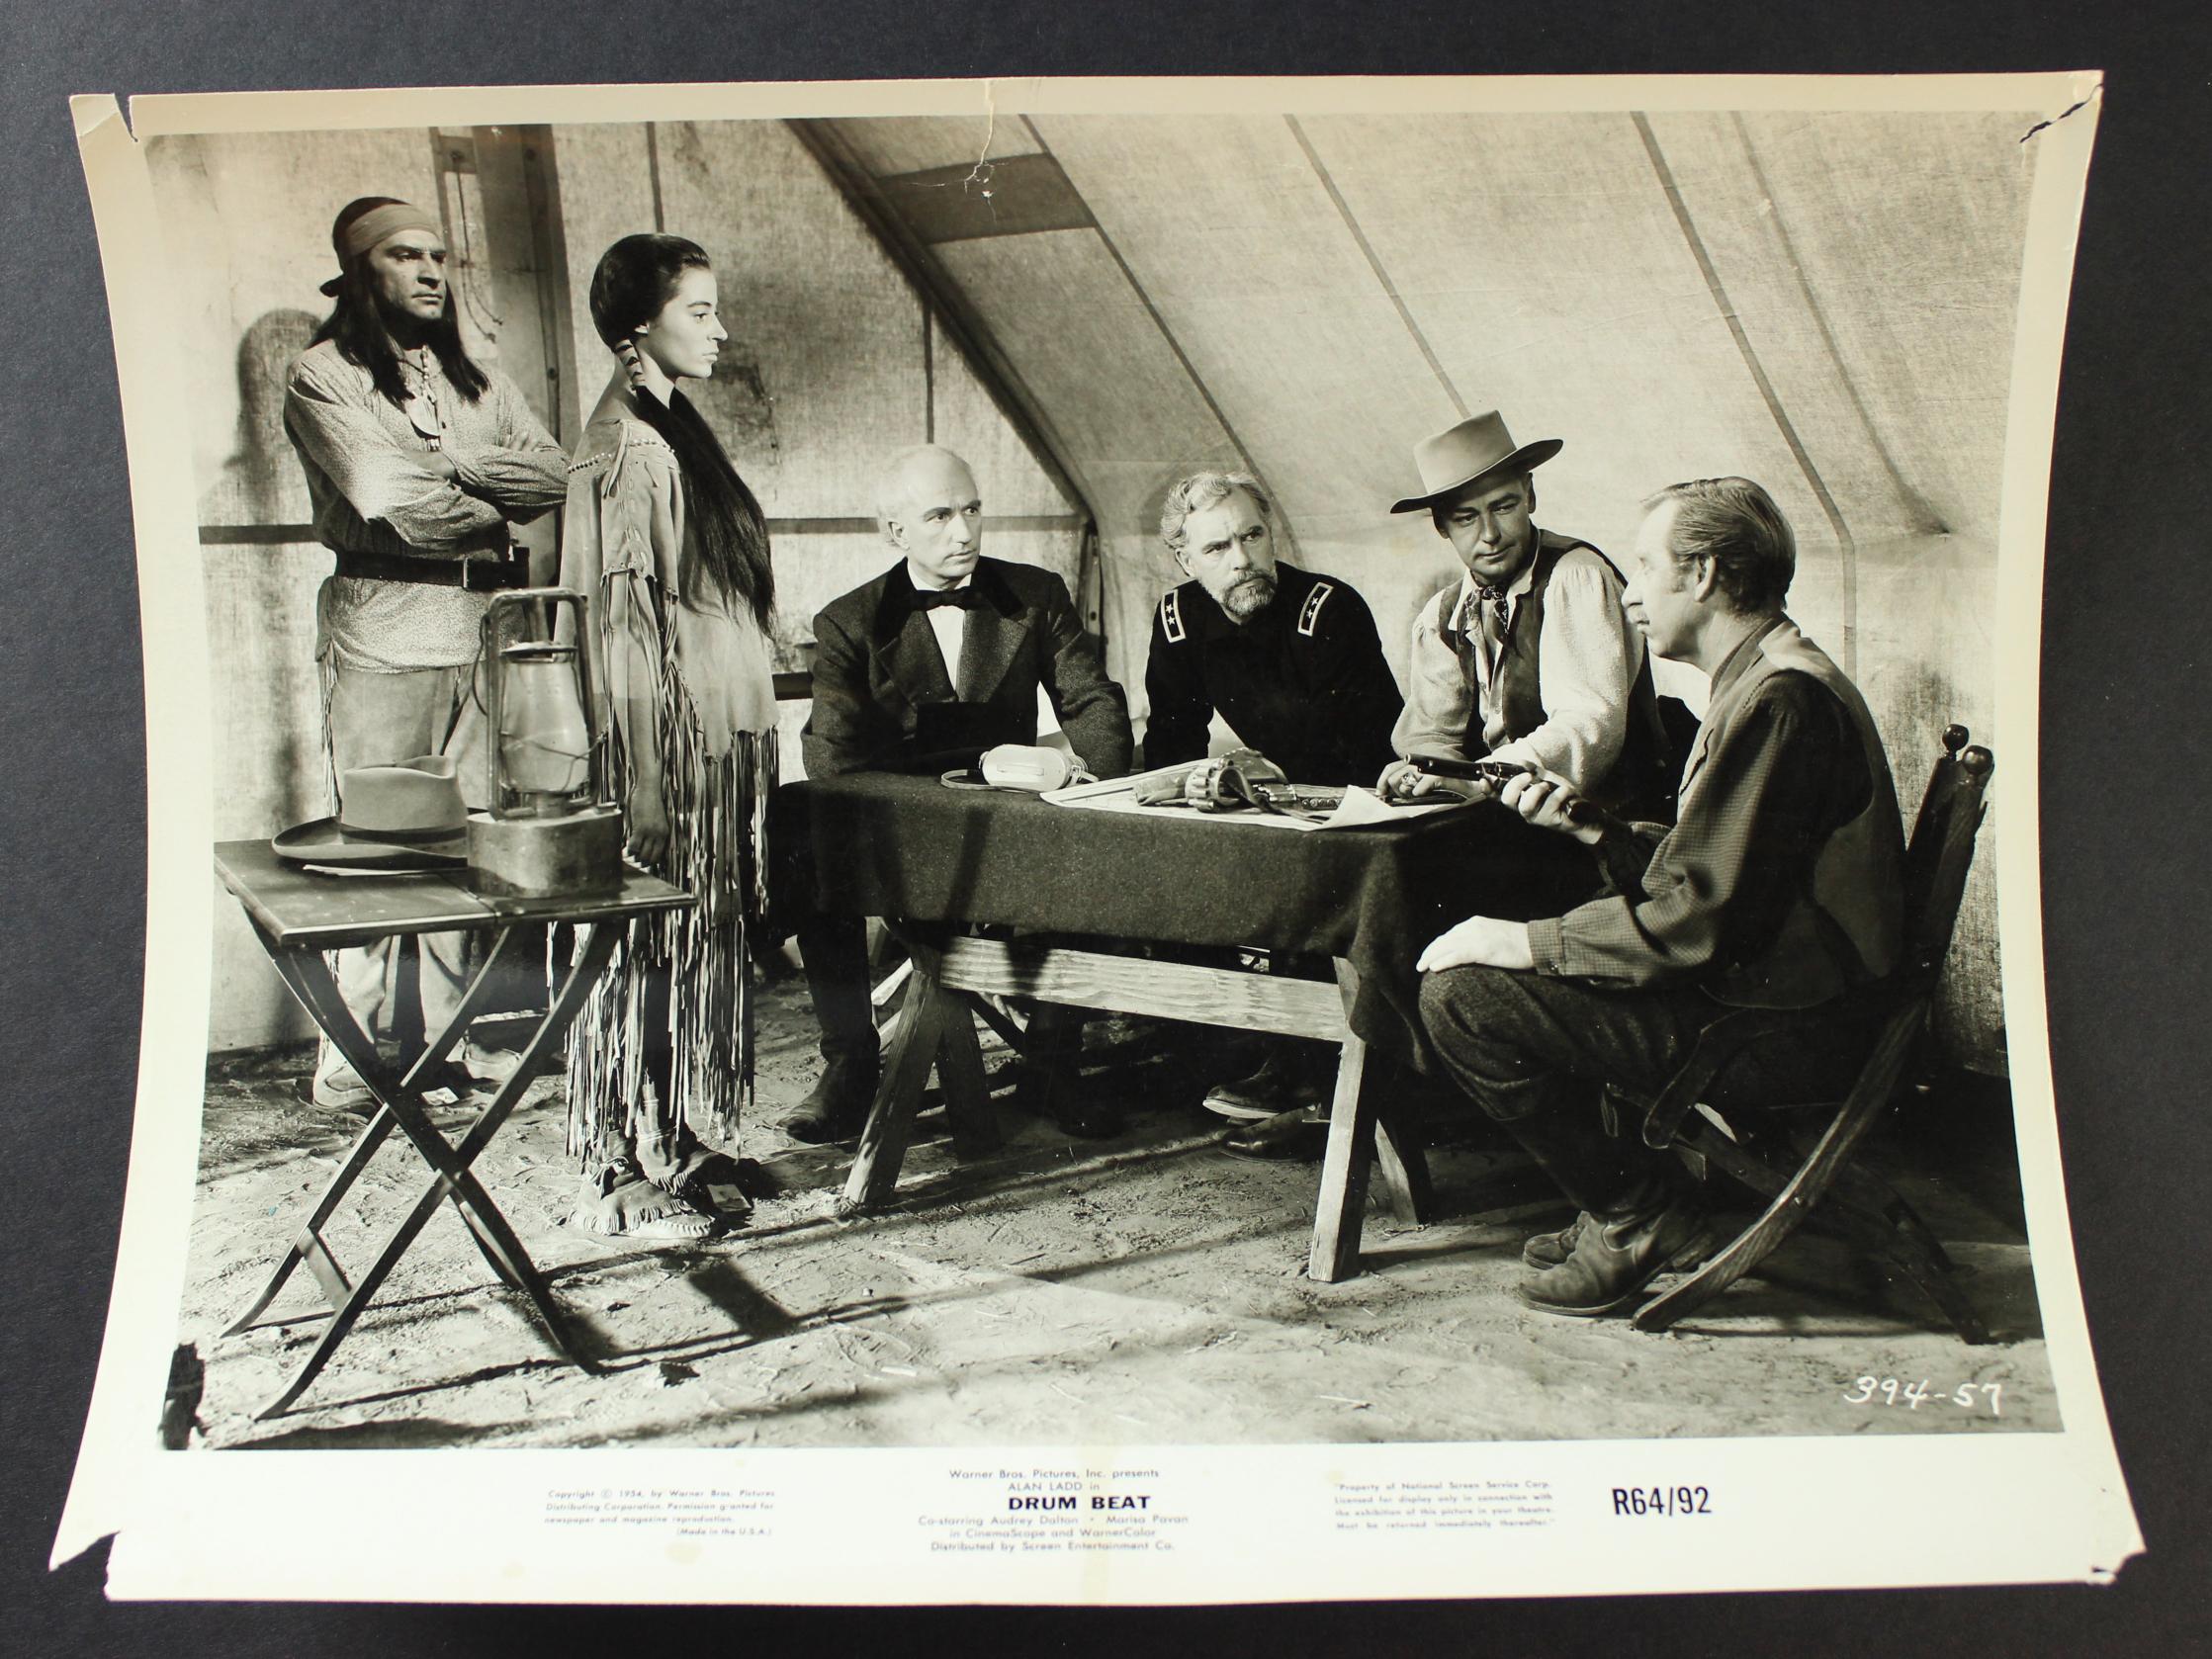 Alan Ladd, Rodolfo Acosta, Warner Anderson, Elisha Cook Jr., Audrey Dalton, and Robert Keith in Drum Beat (1954)